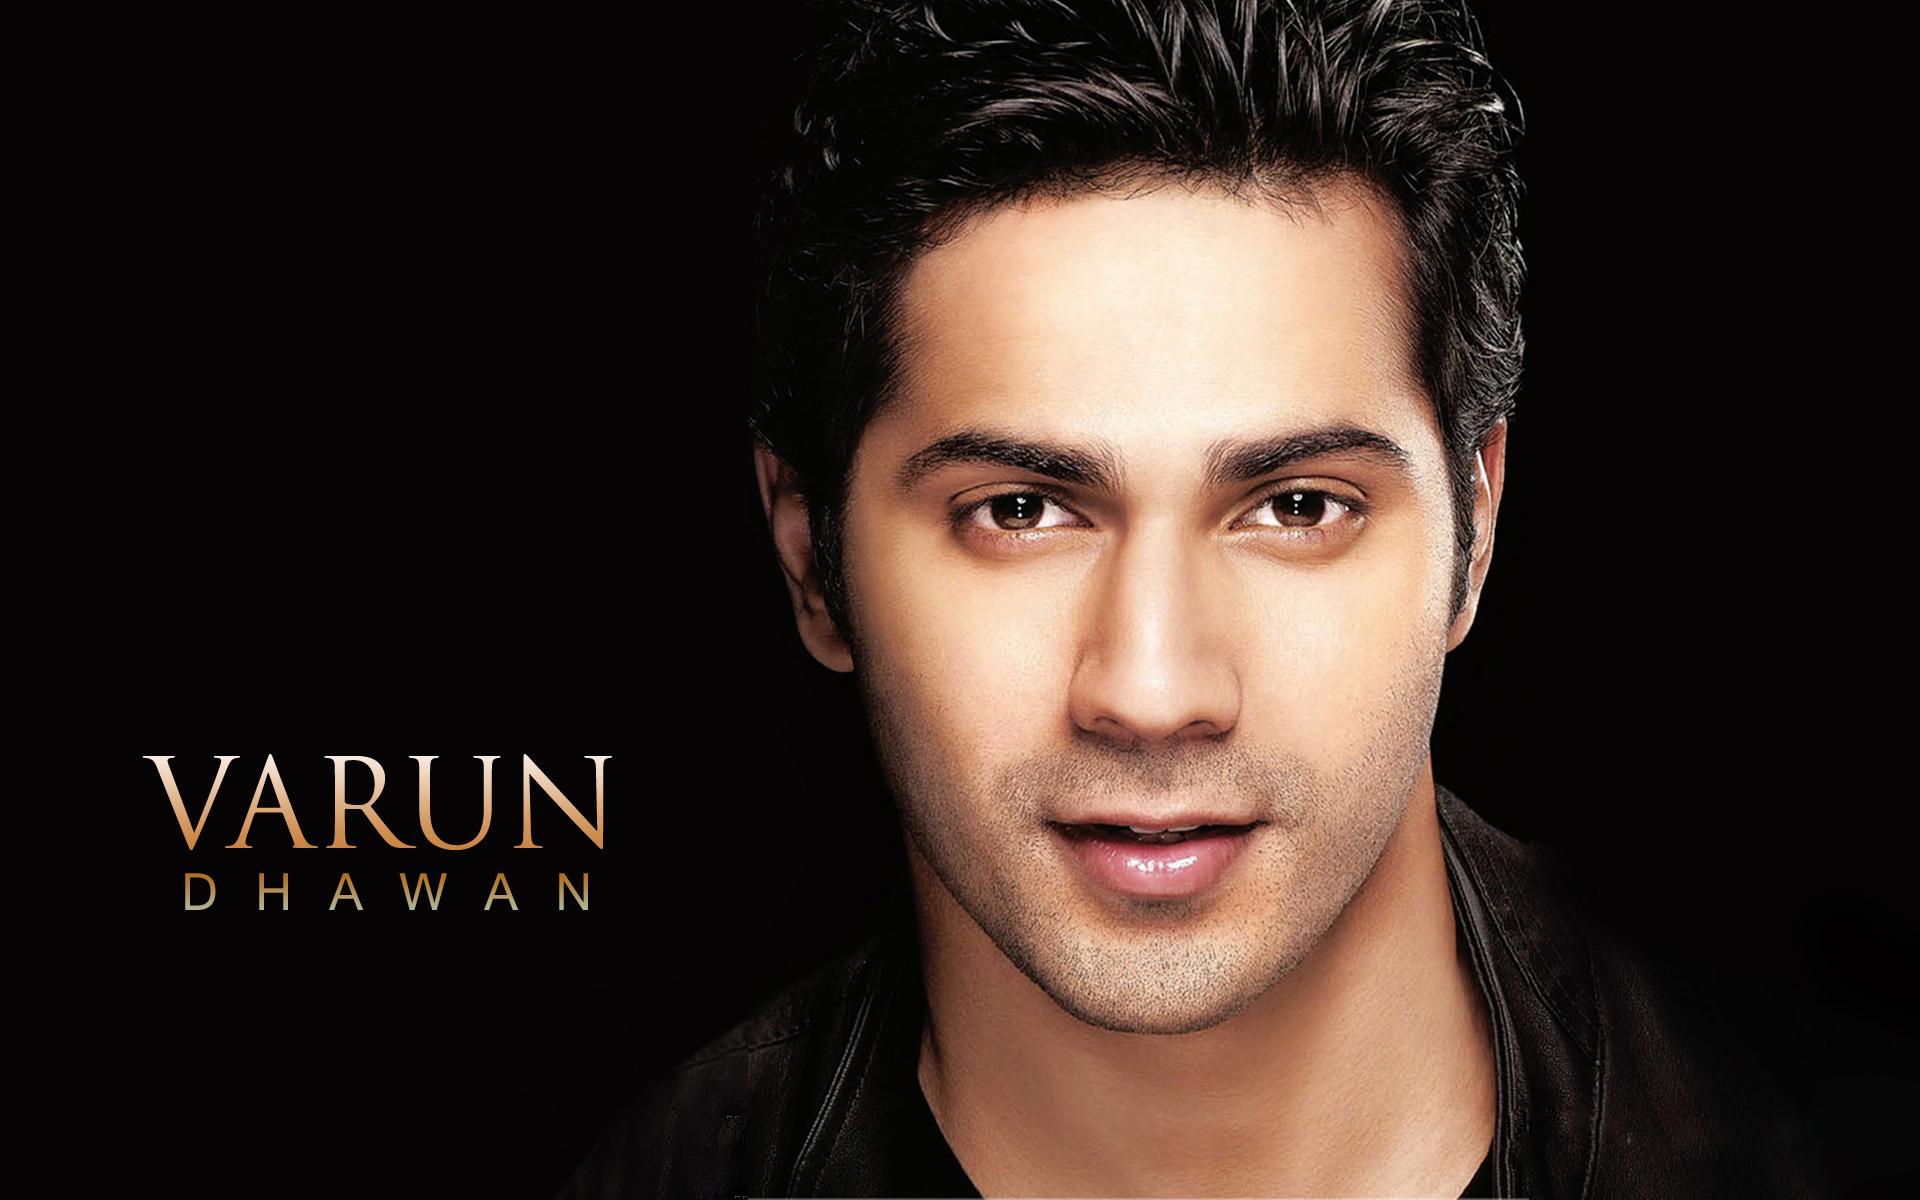 Bollywood Singers Hd Wallpapers Varun Dhawan Photos Images Pics Amp Hd Wallpapers Download